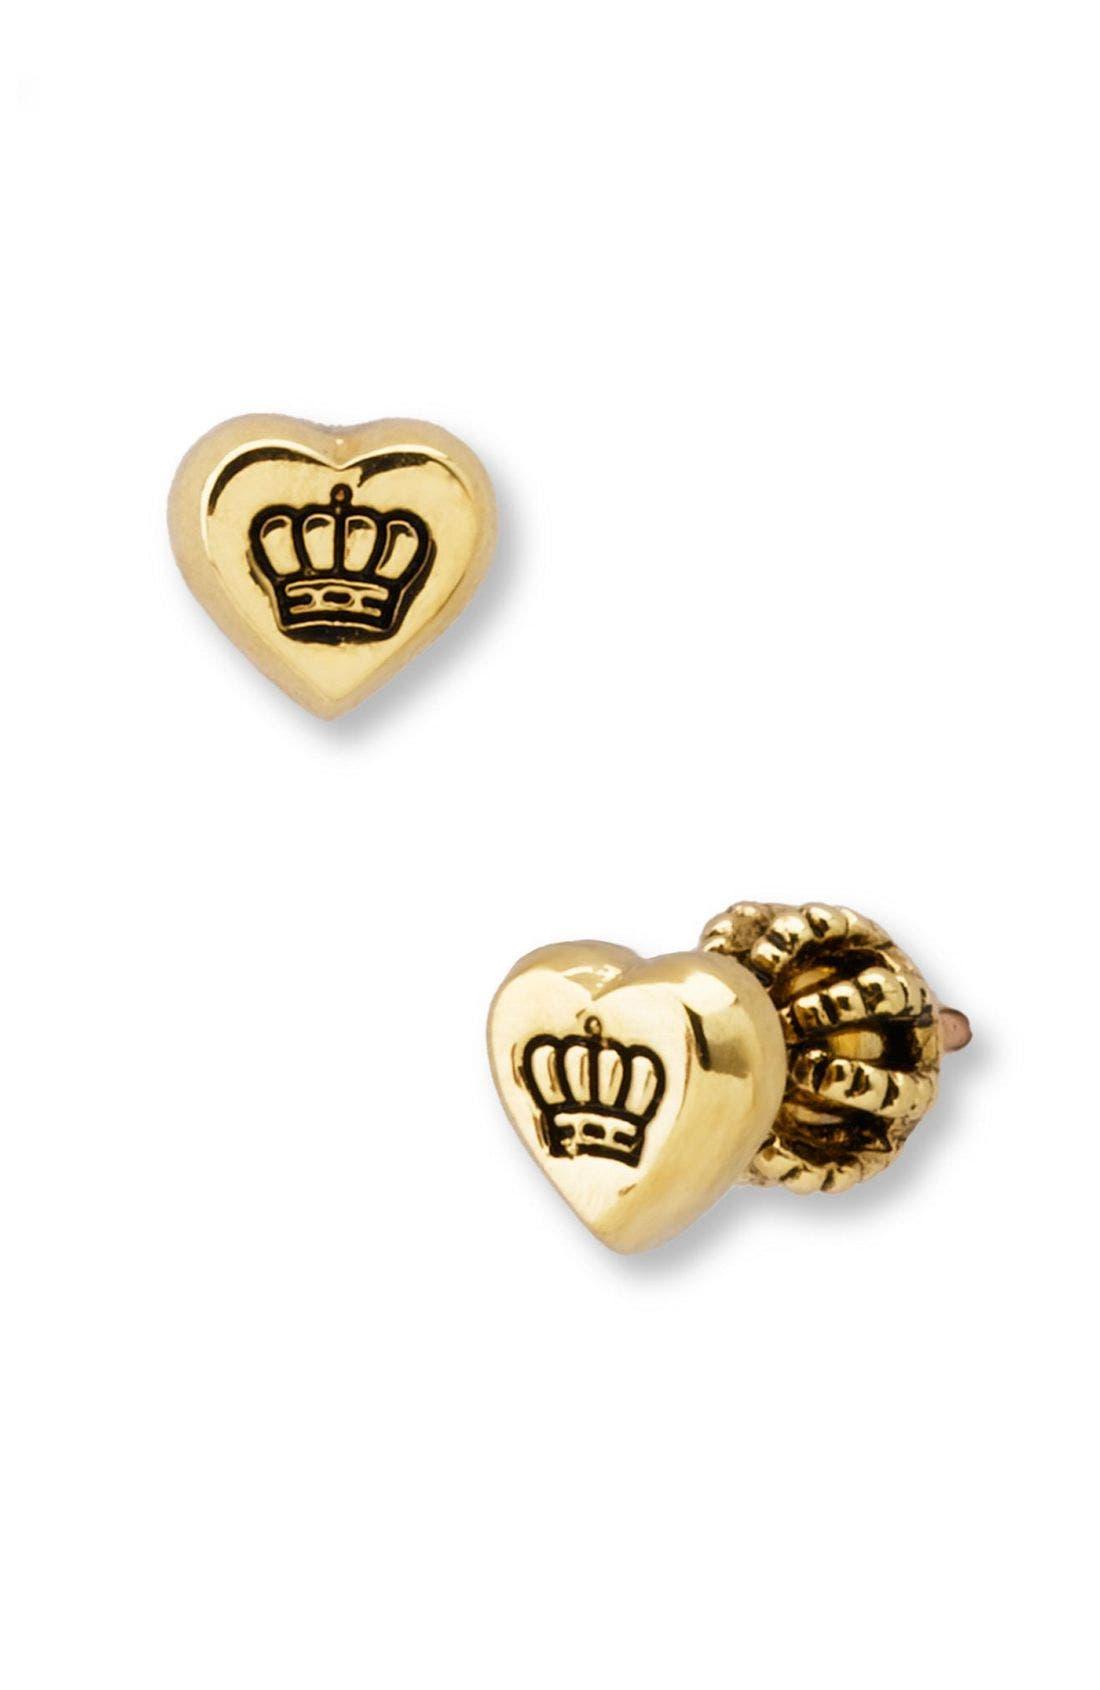 Main Image - Juicy Couture Heart Stud Earrings